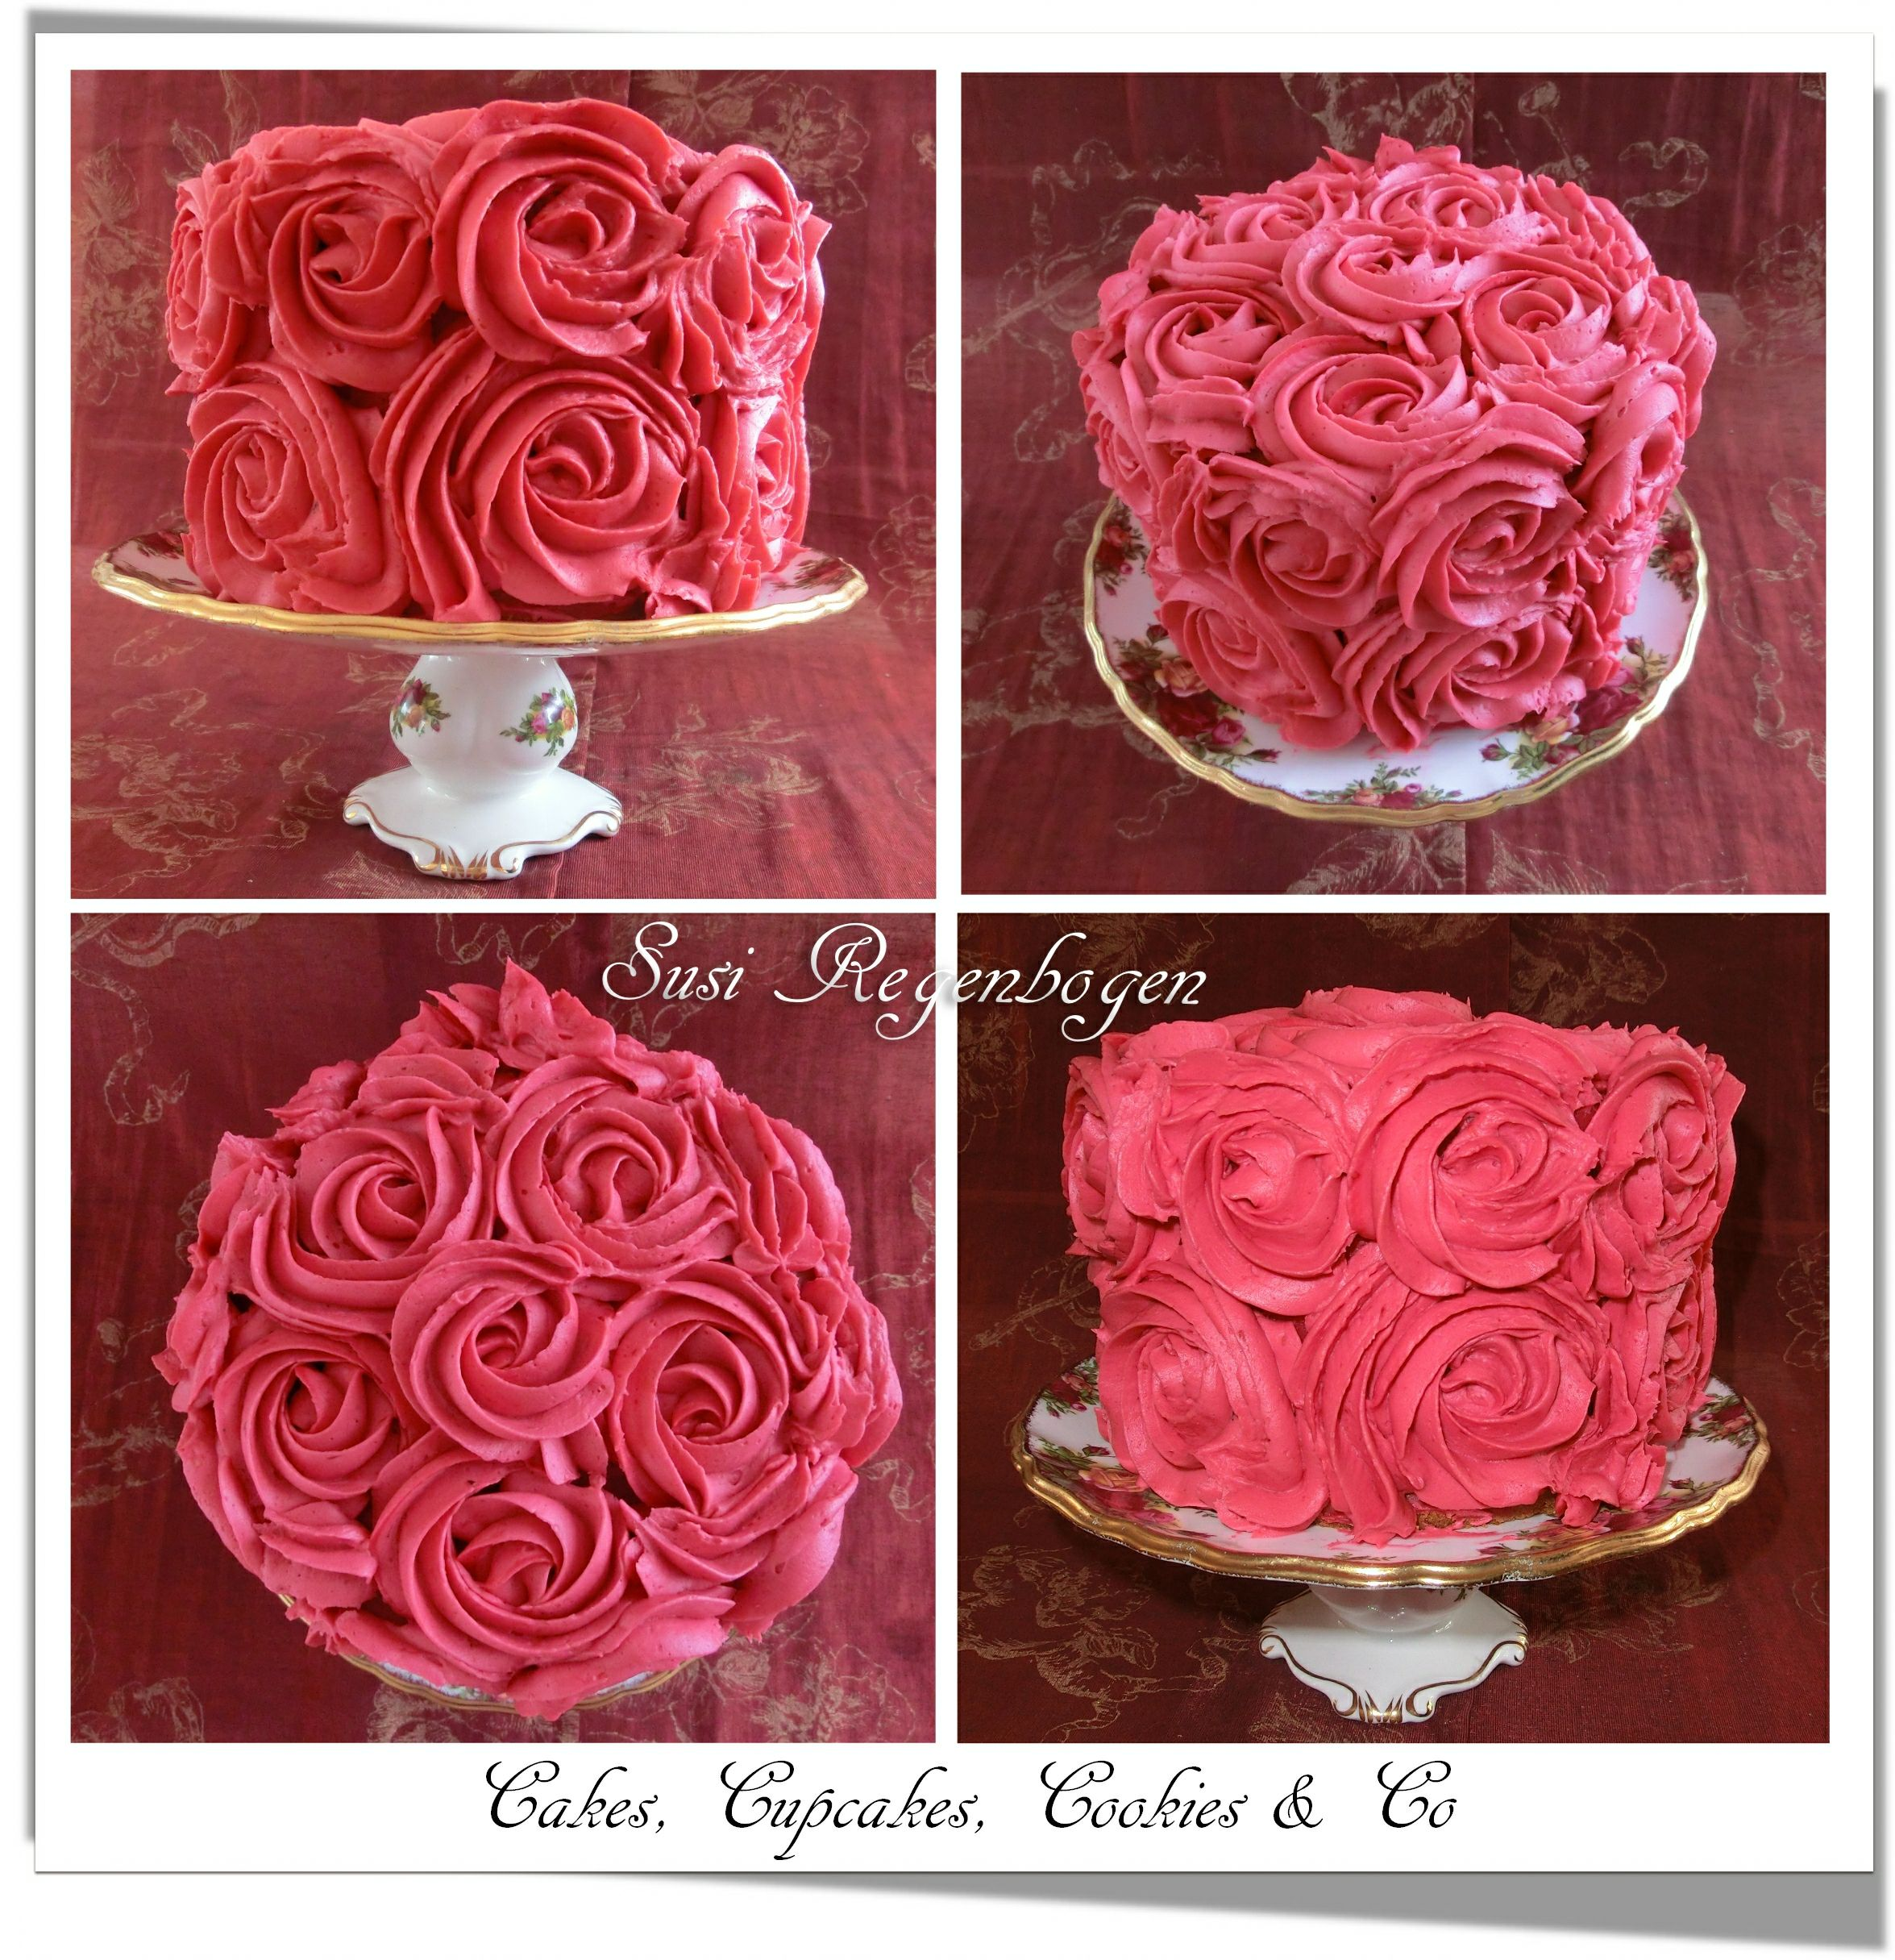 buttercreme rosen torte buttercreme roses cake essen pinterest tolle torten meine torte. Black Bedroom Furniture Sets. Home Design Ideas